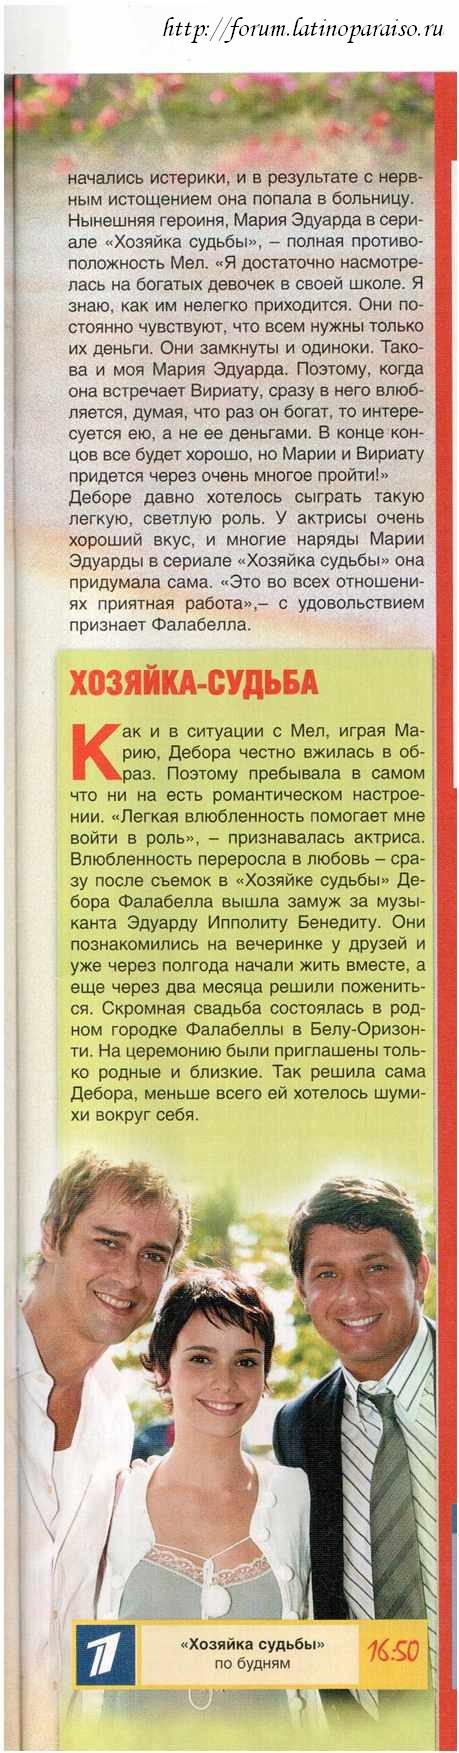 http://www.imageup.ru/img169/6f363778.jpg